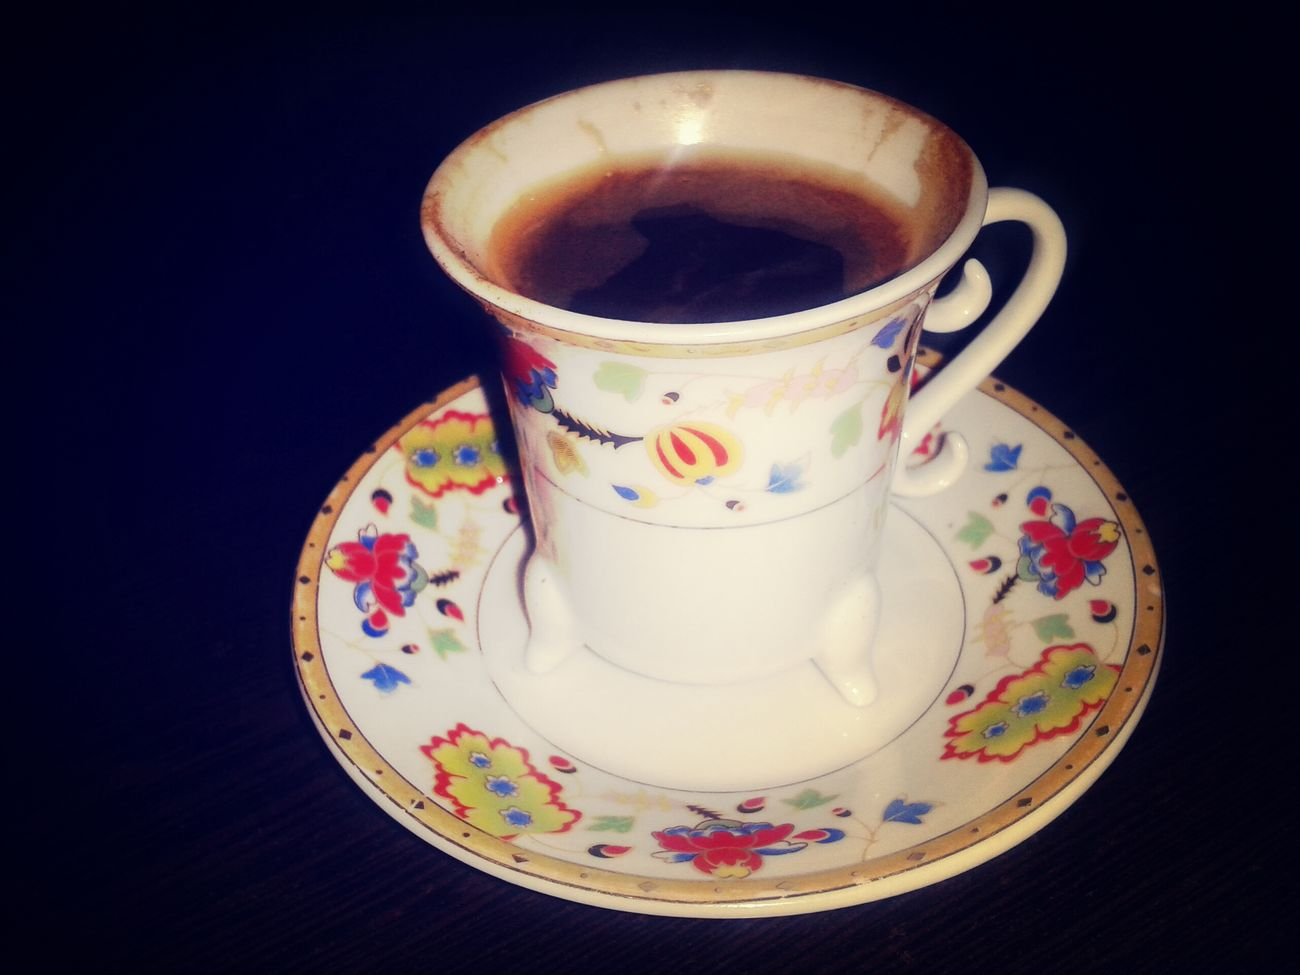 Turkish Coffee Balıkesir Fatih Gündoğdu Hello World